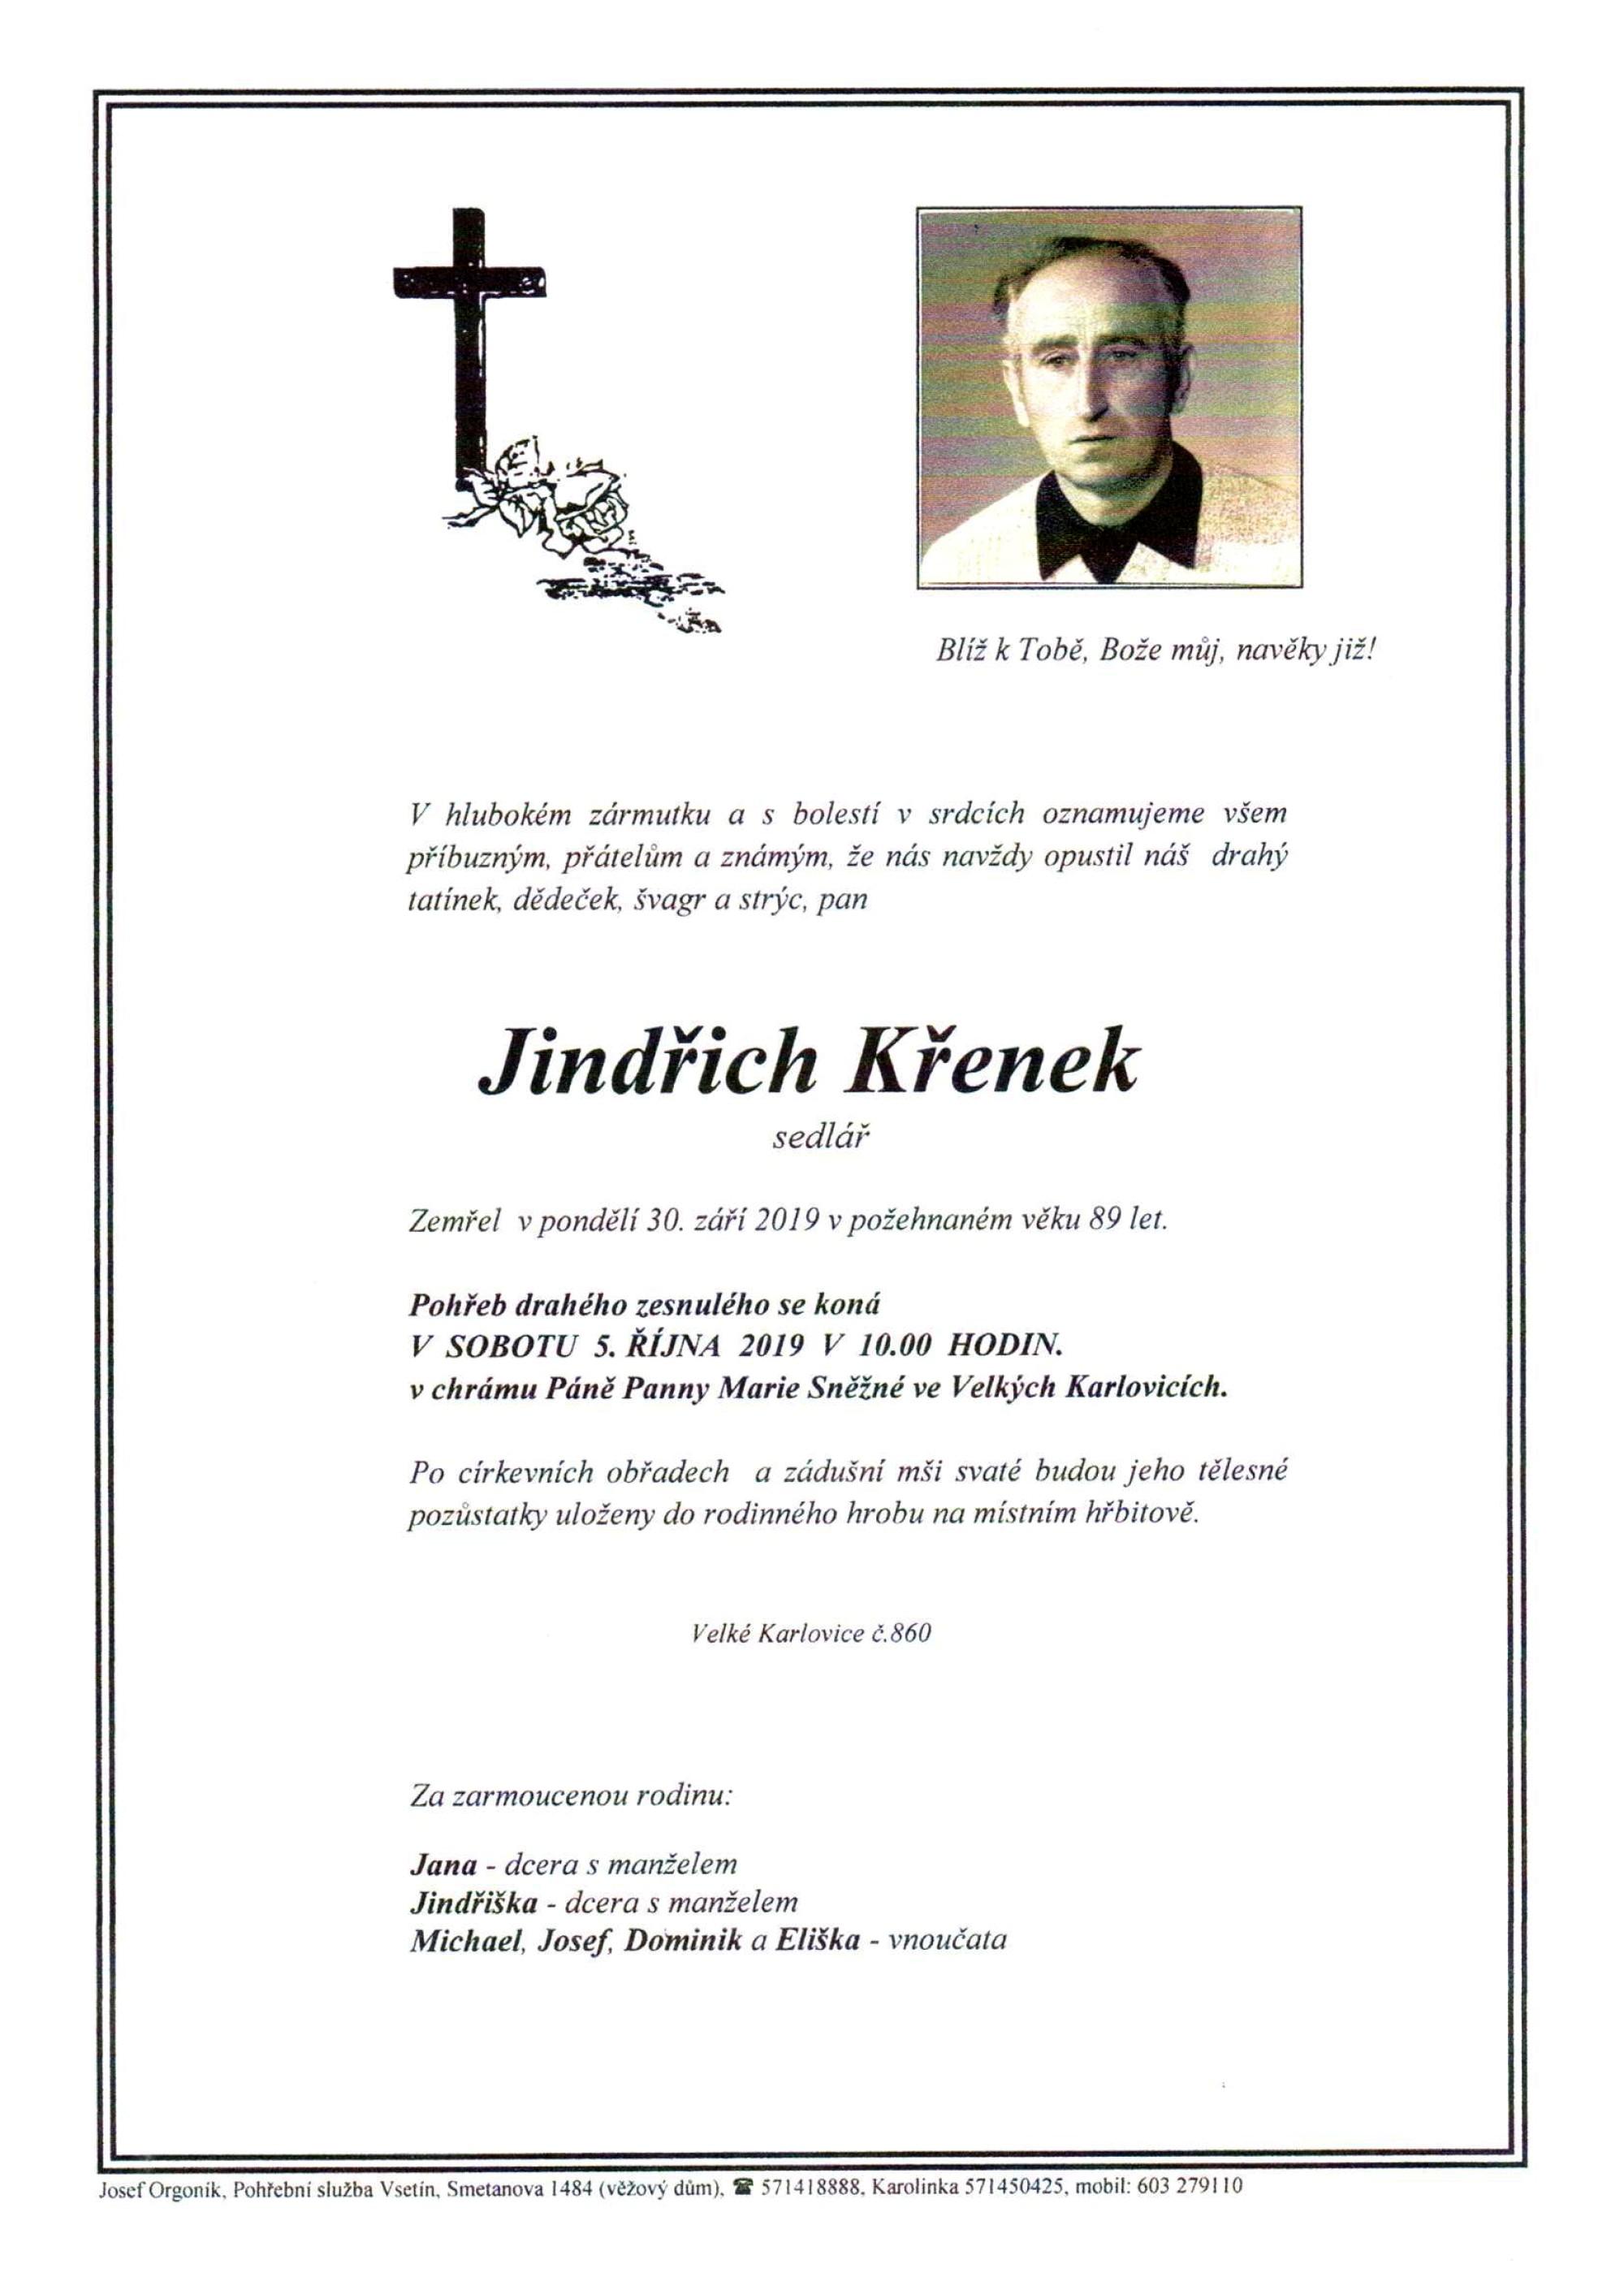 Jindřich Křenek